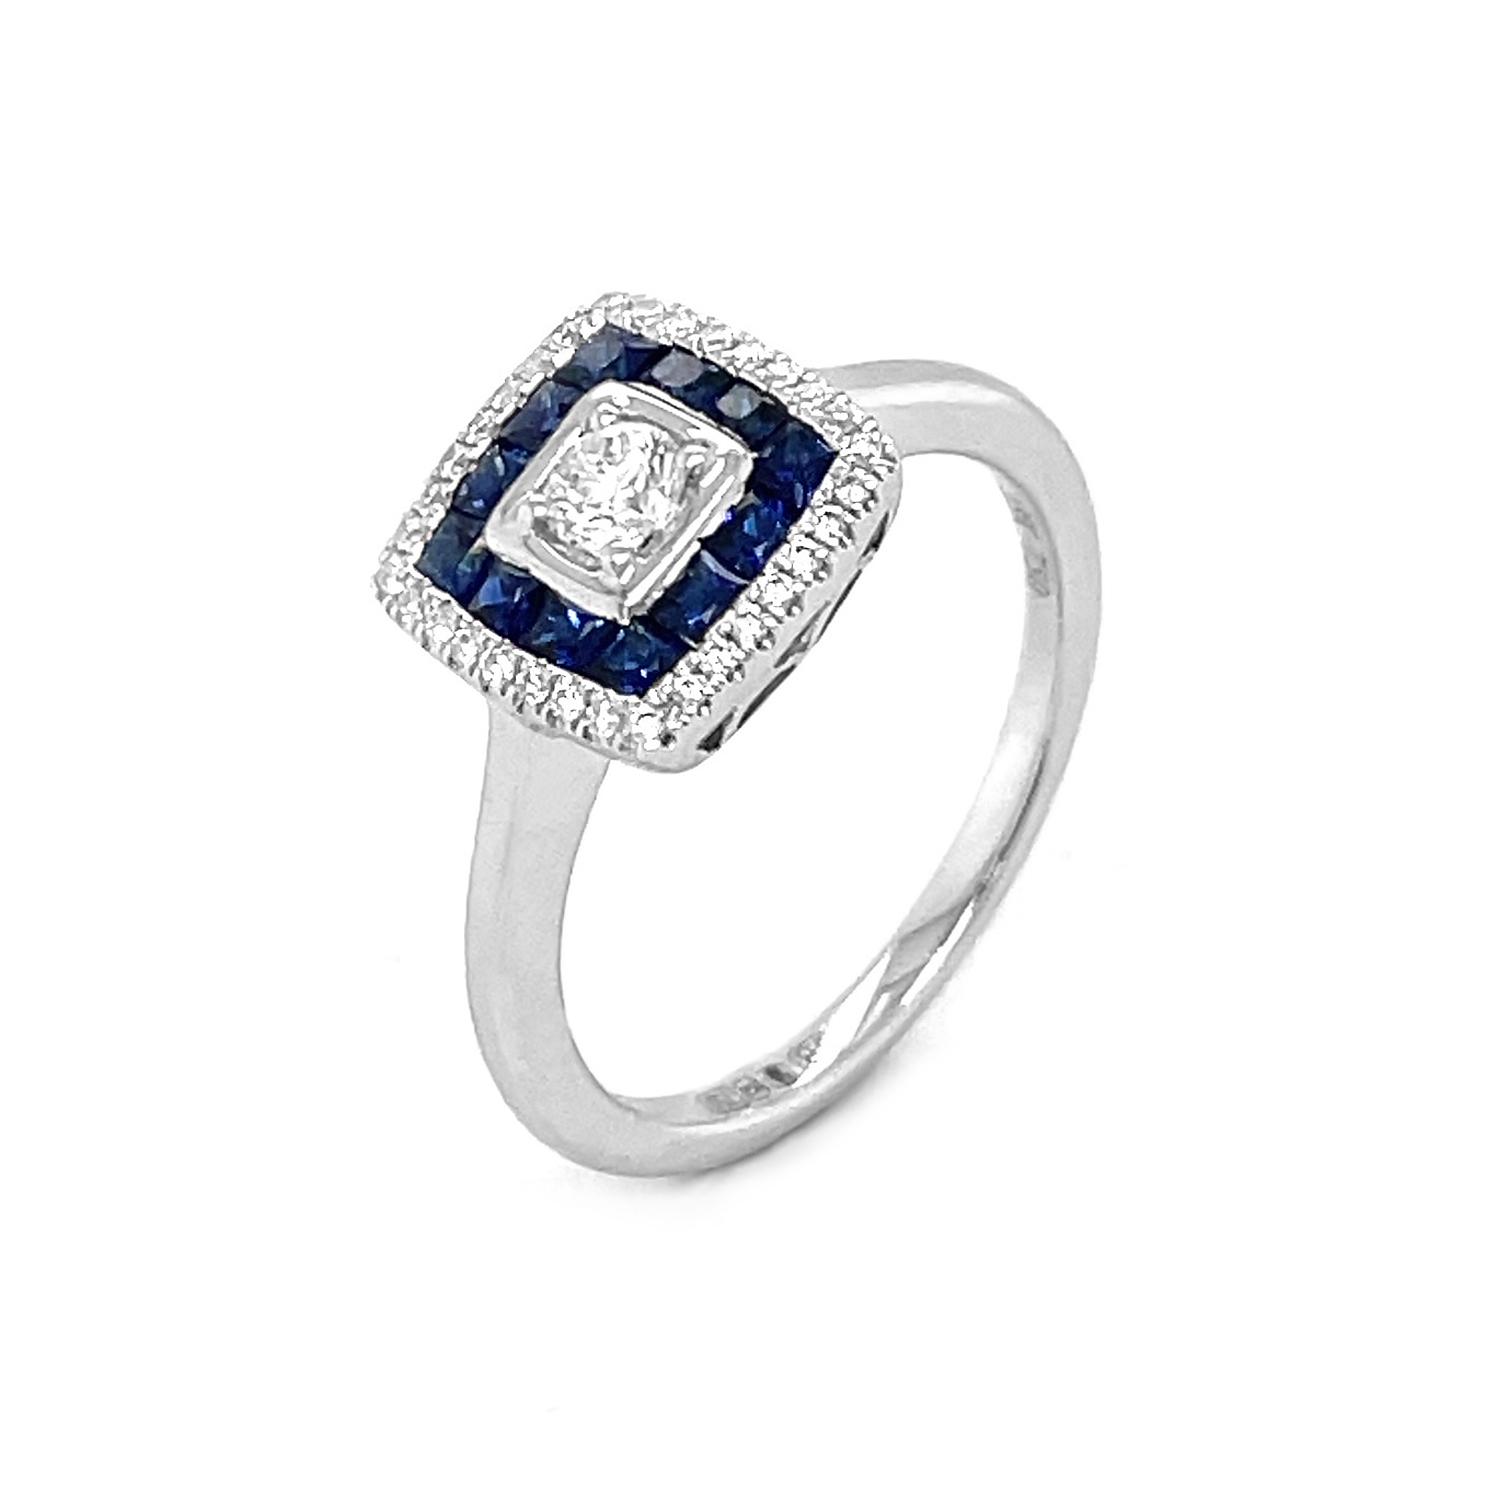 18k White Gold Square Sapphires & Brilliant Cut Diamond Cluster Ring